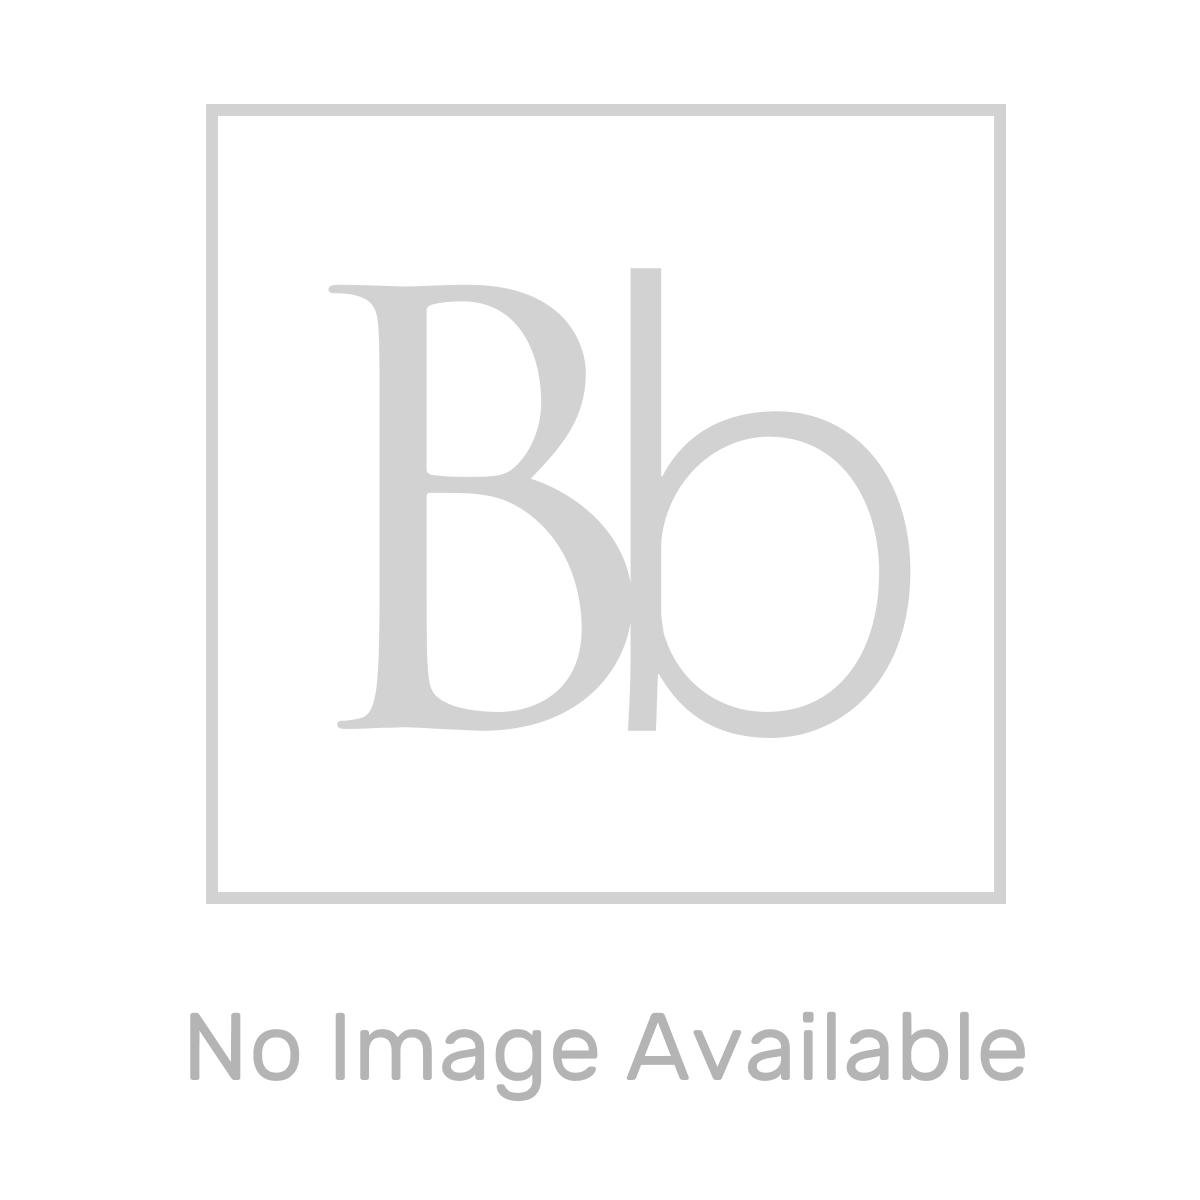 RAK Maremma Grey Matt Tile 750 x 750mm Lifestyle